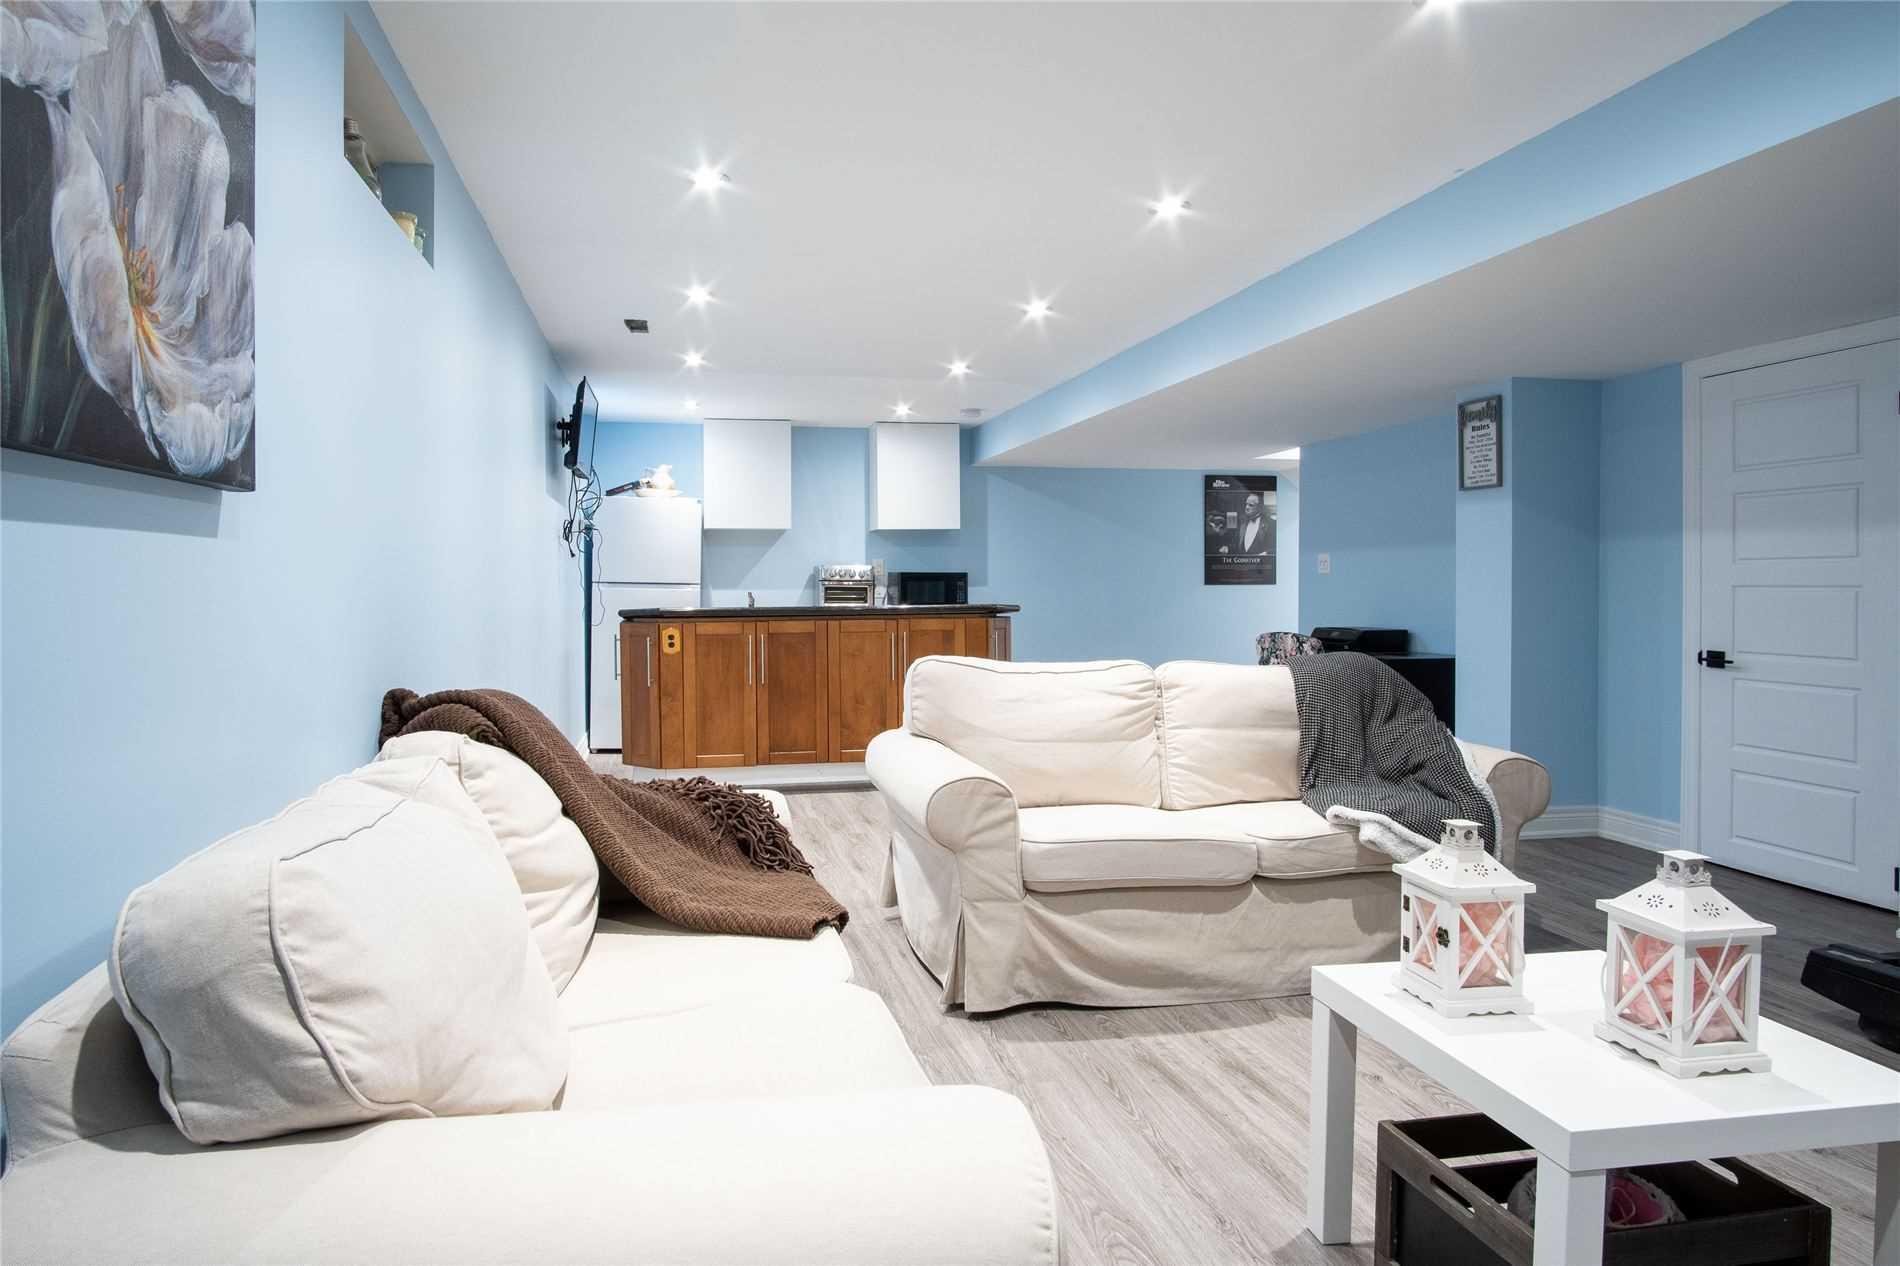 827 Biggar Hts - Coates Detached for sale, 4 Bedrooms (W5400280) - #26